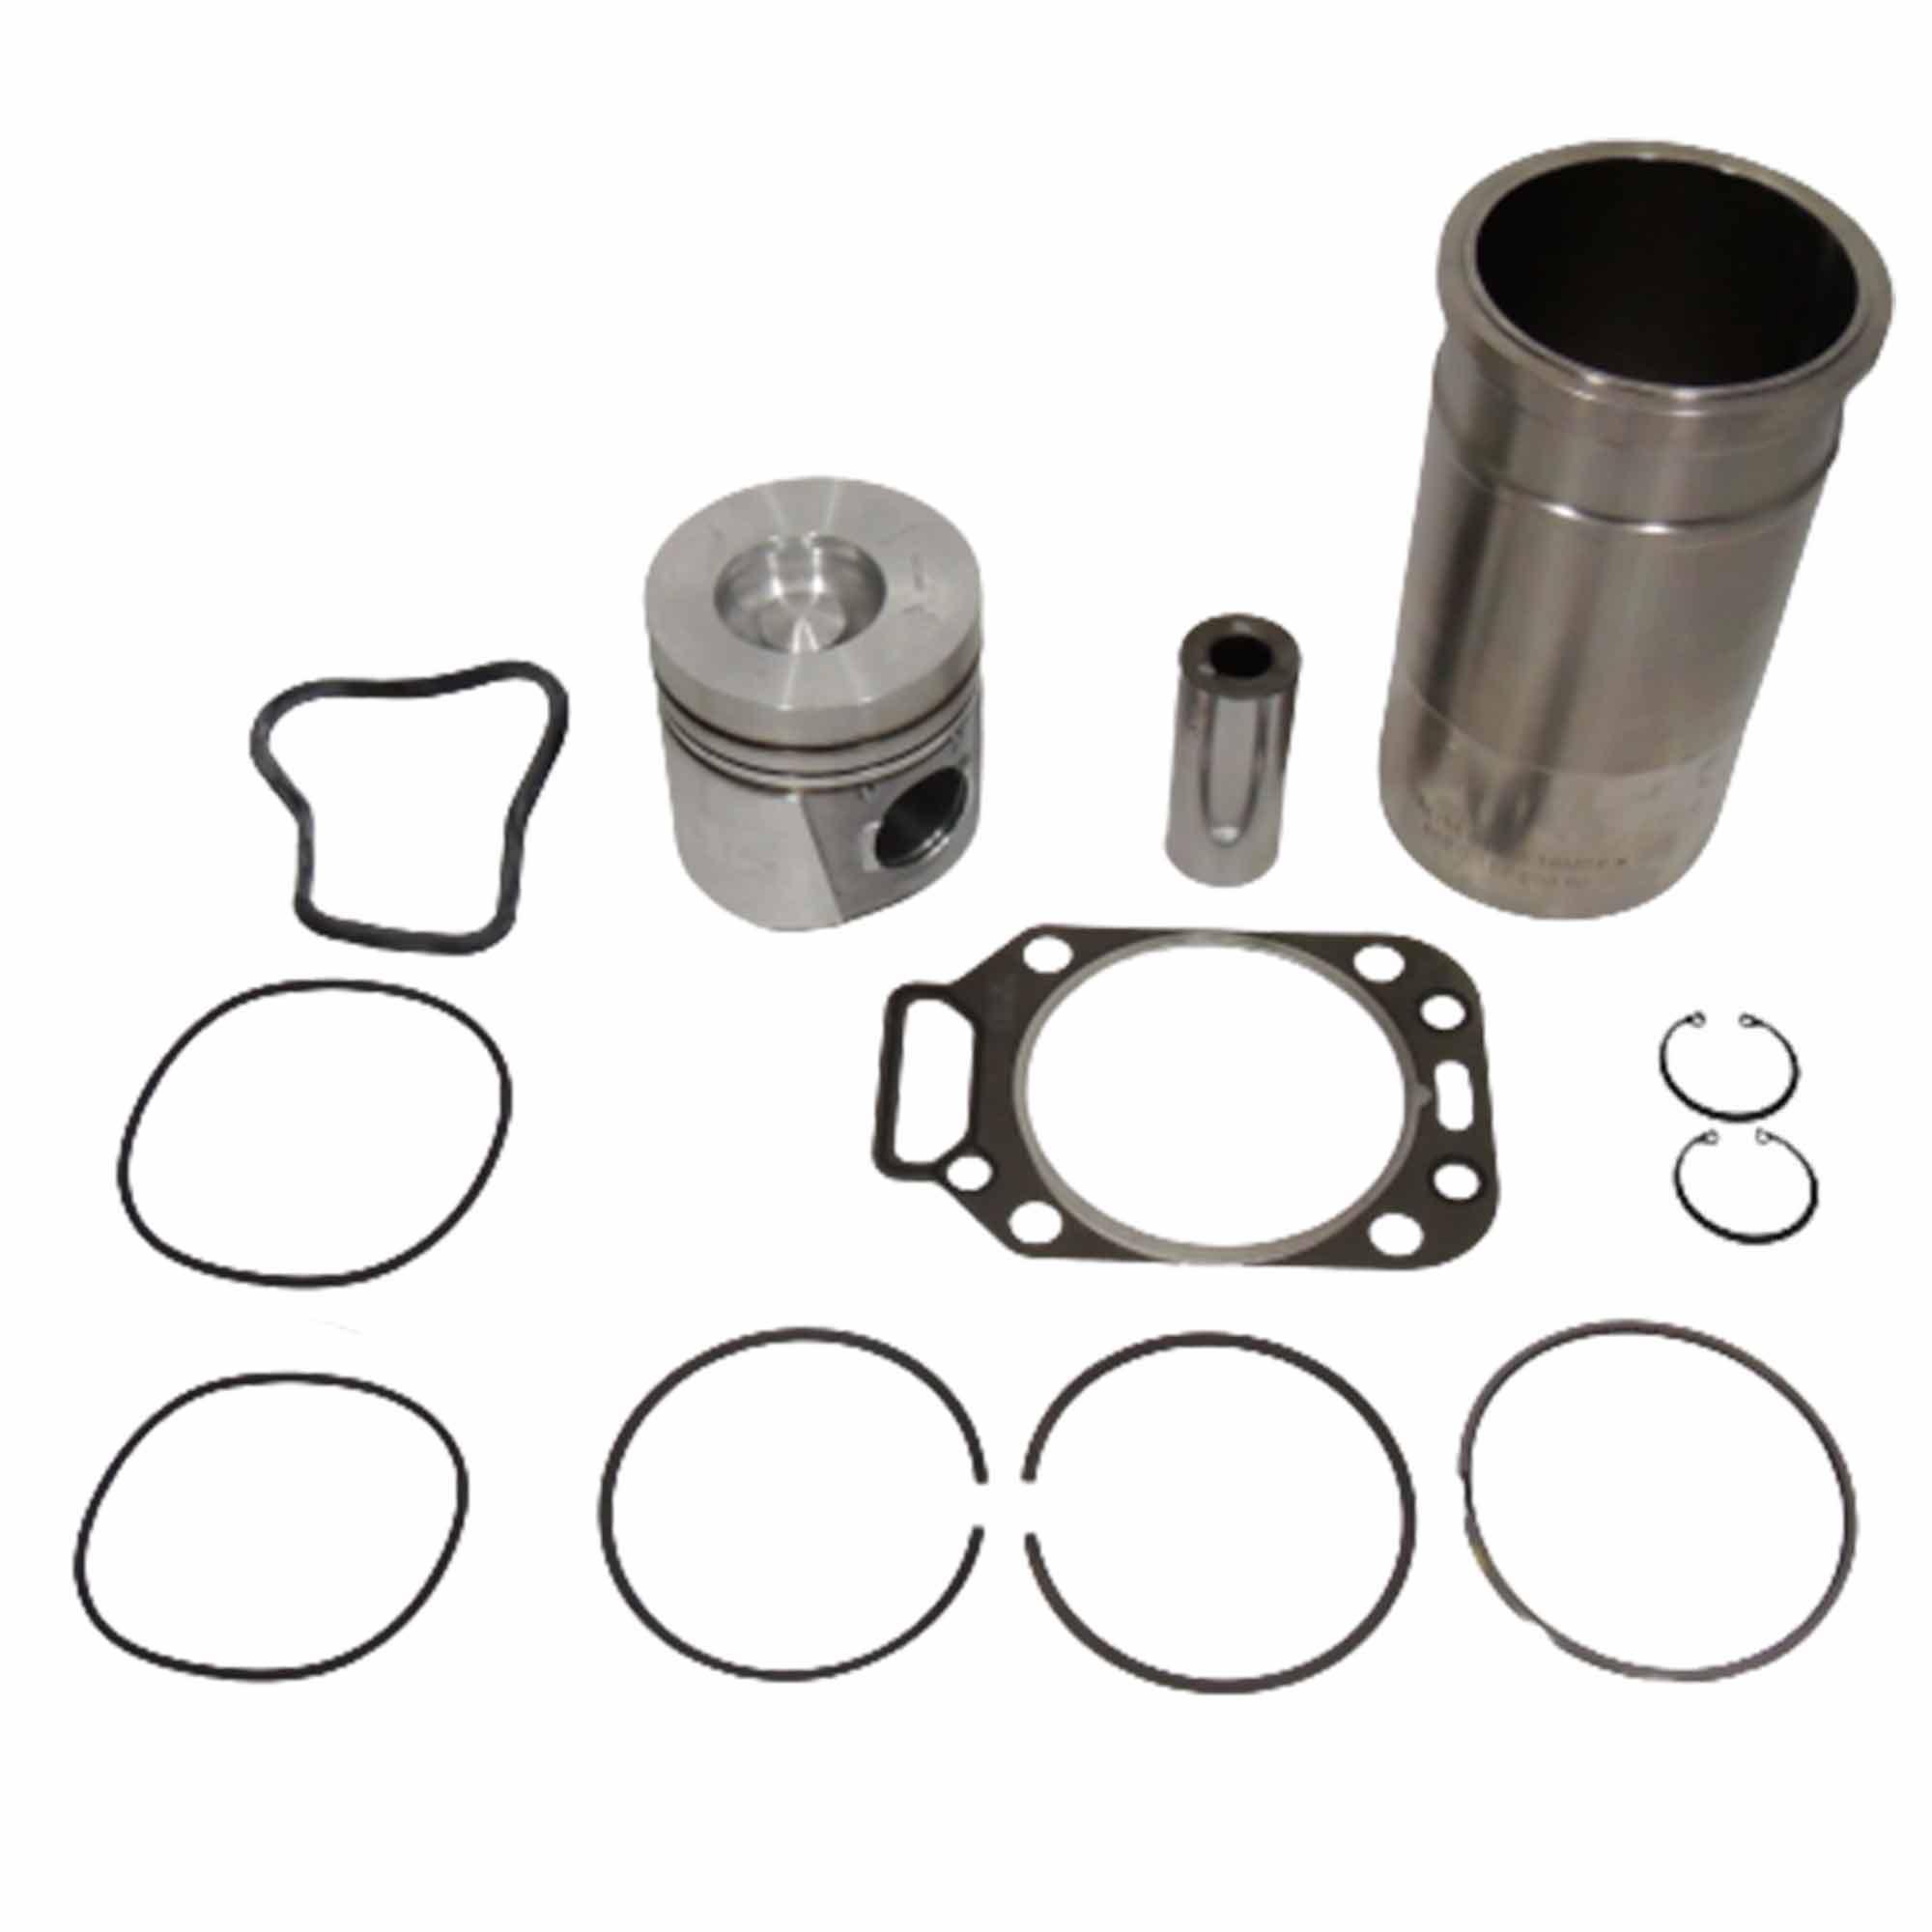 941080191128 - Kit de reparo para 1 cilindro